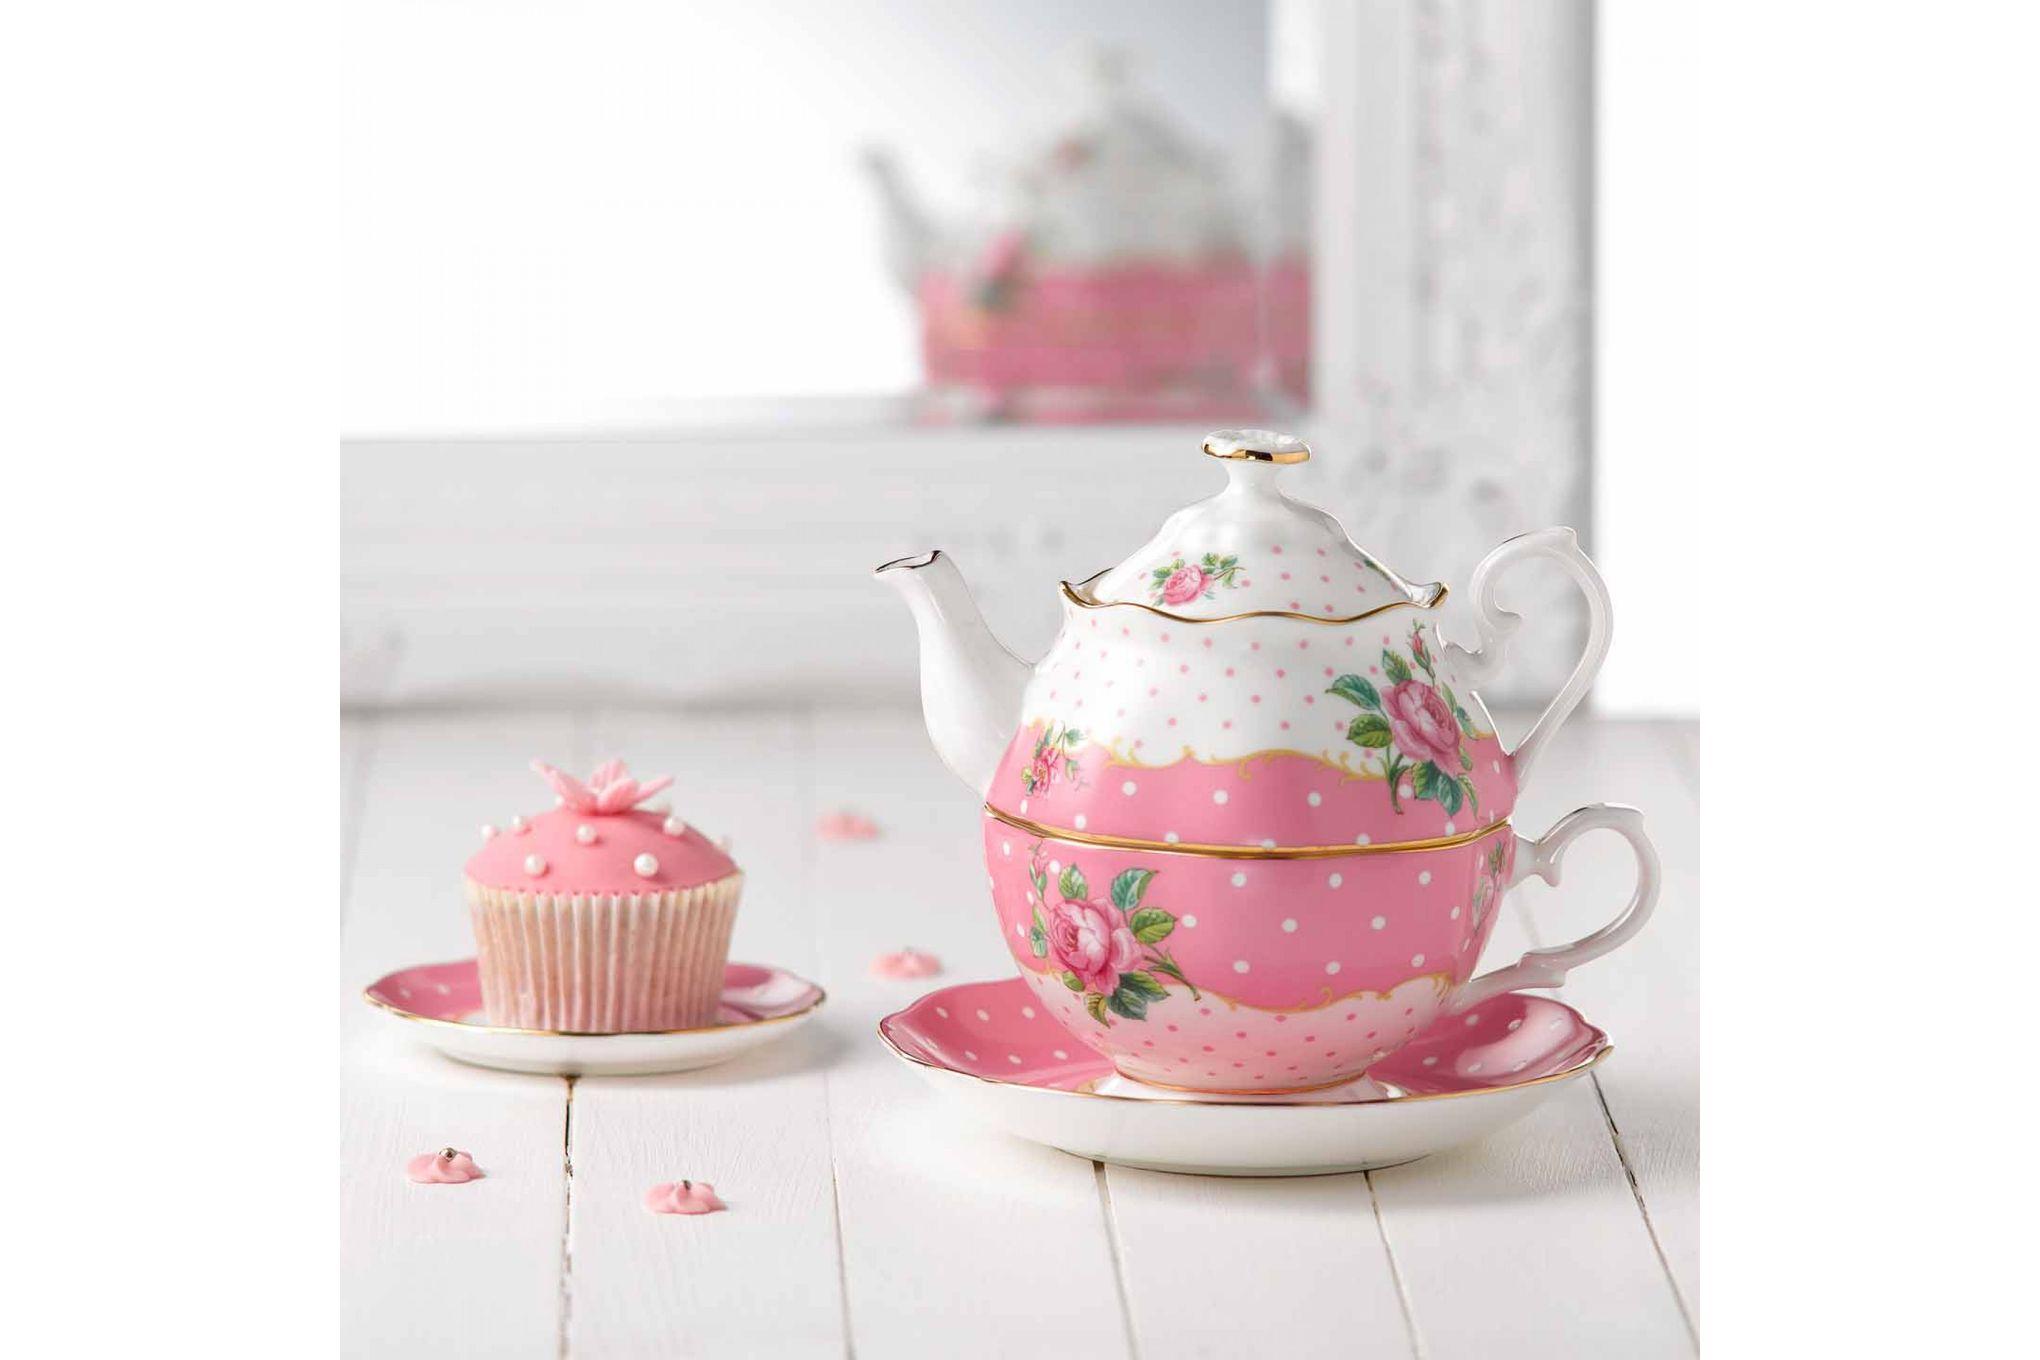 Royal Albert Cheeky Pink Tea For One Vintage Shape - Gift Boxed thumb 3